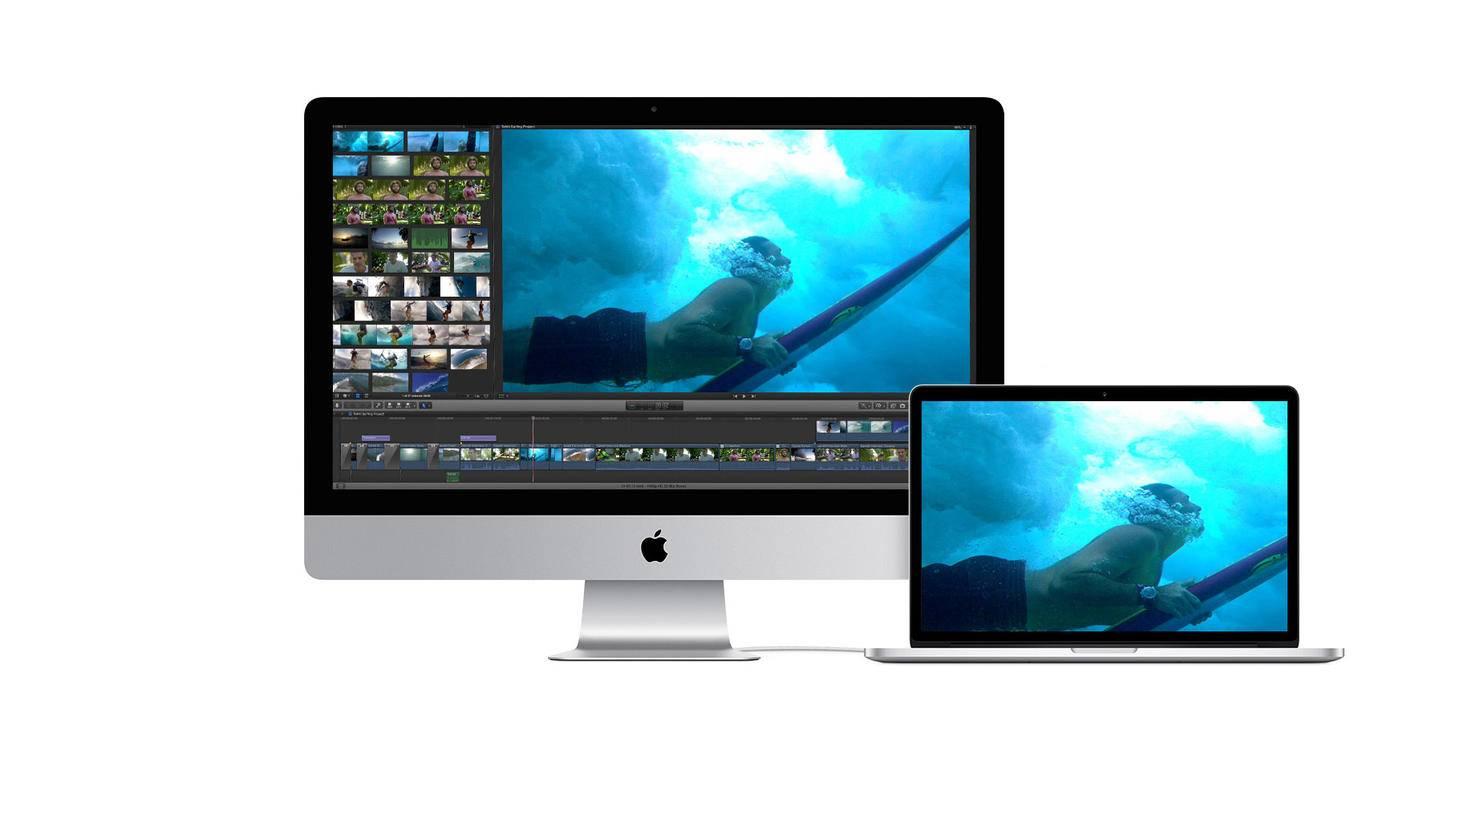 iMac ist mit MacBook per Kabel verbunden